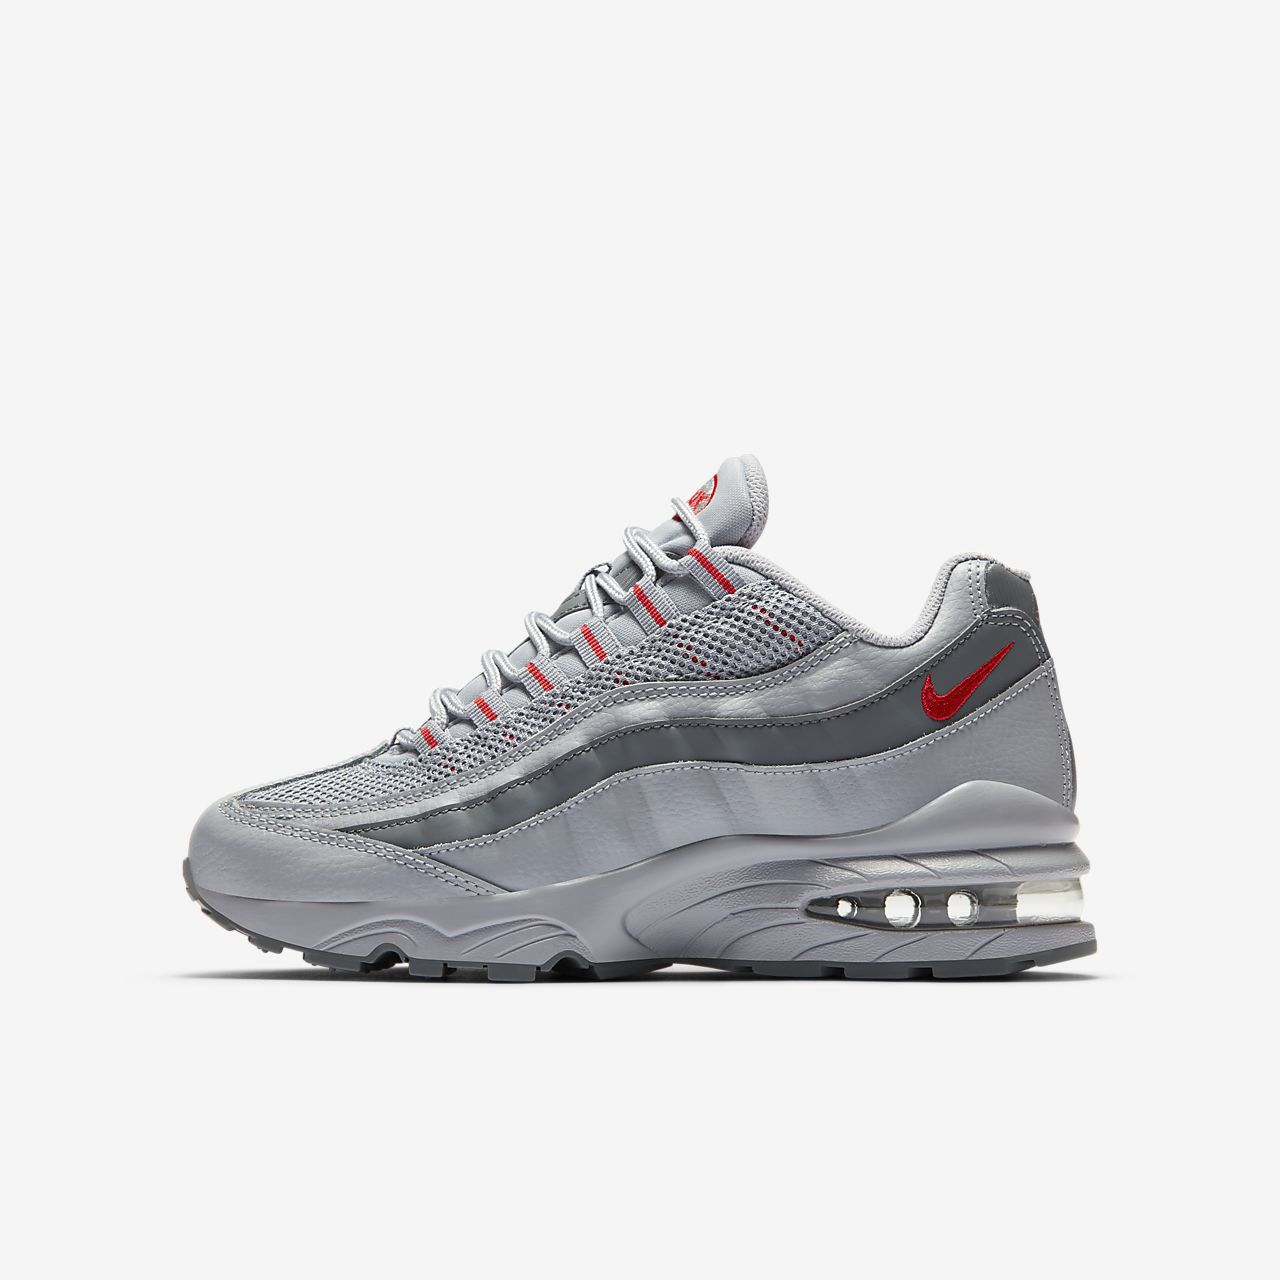 98615aa49f9 ... usa nike air max 95 se older kids shoe 41dfd d8968